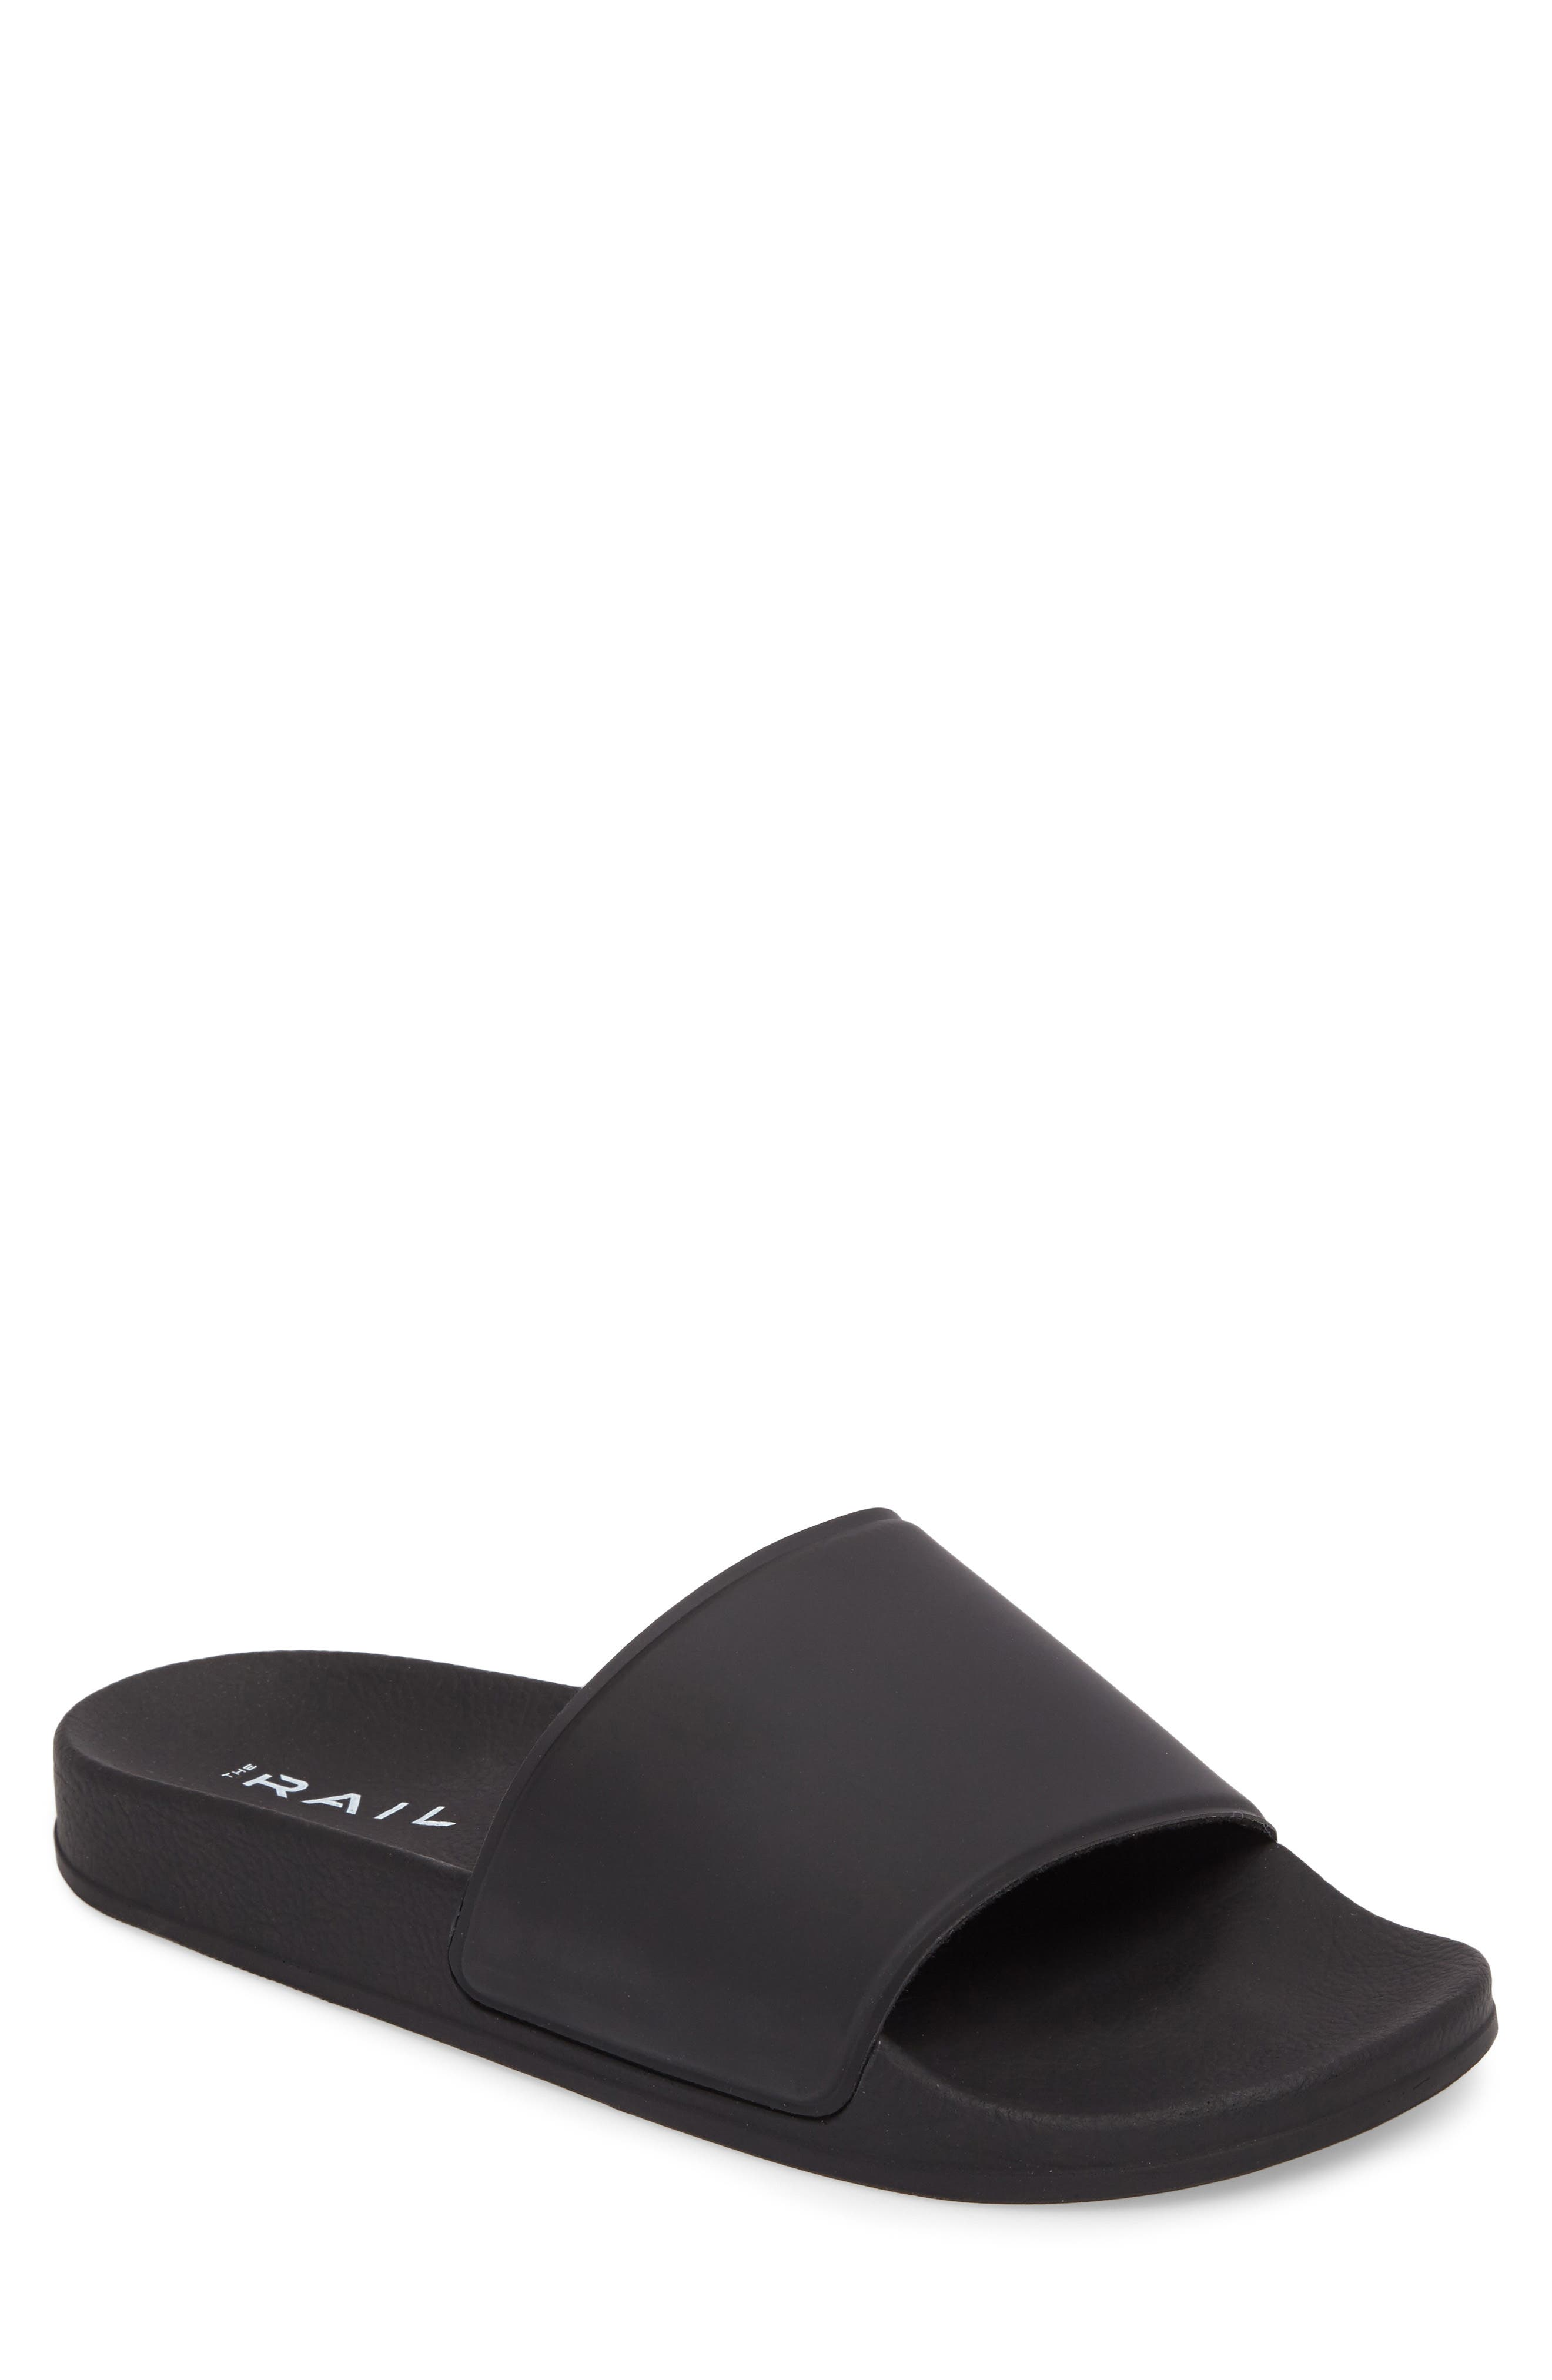 Bondi Slide Sandal, Main, color, BLACK